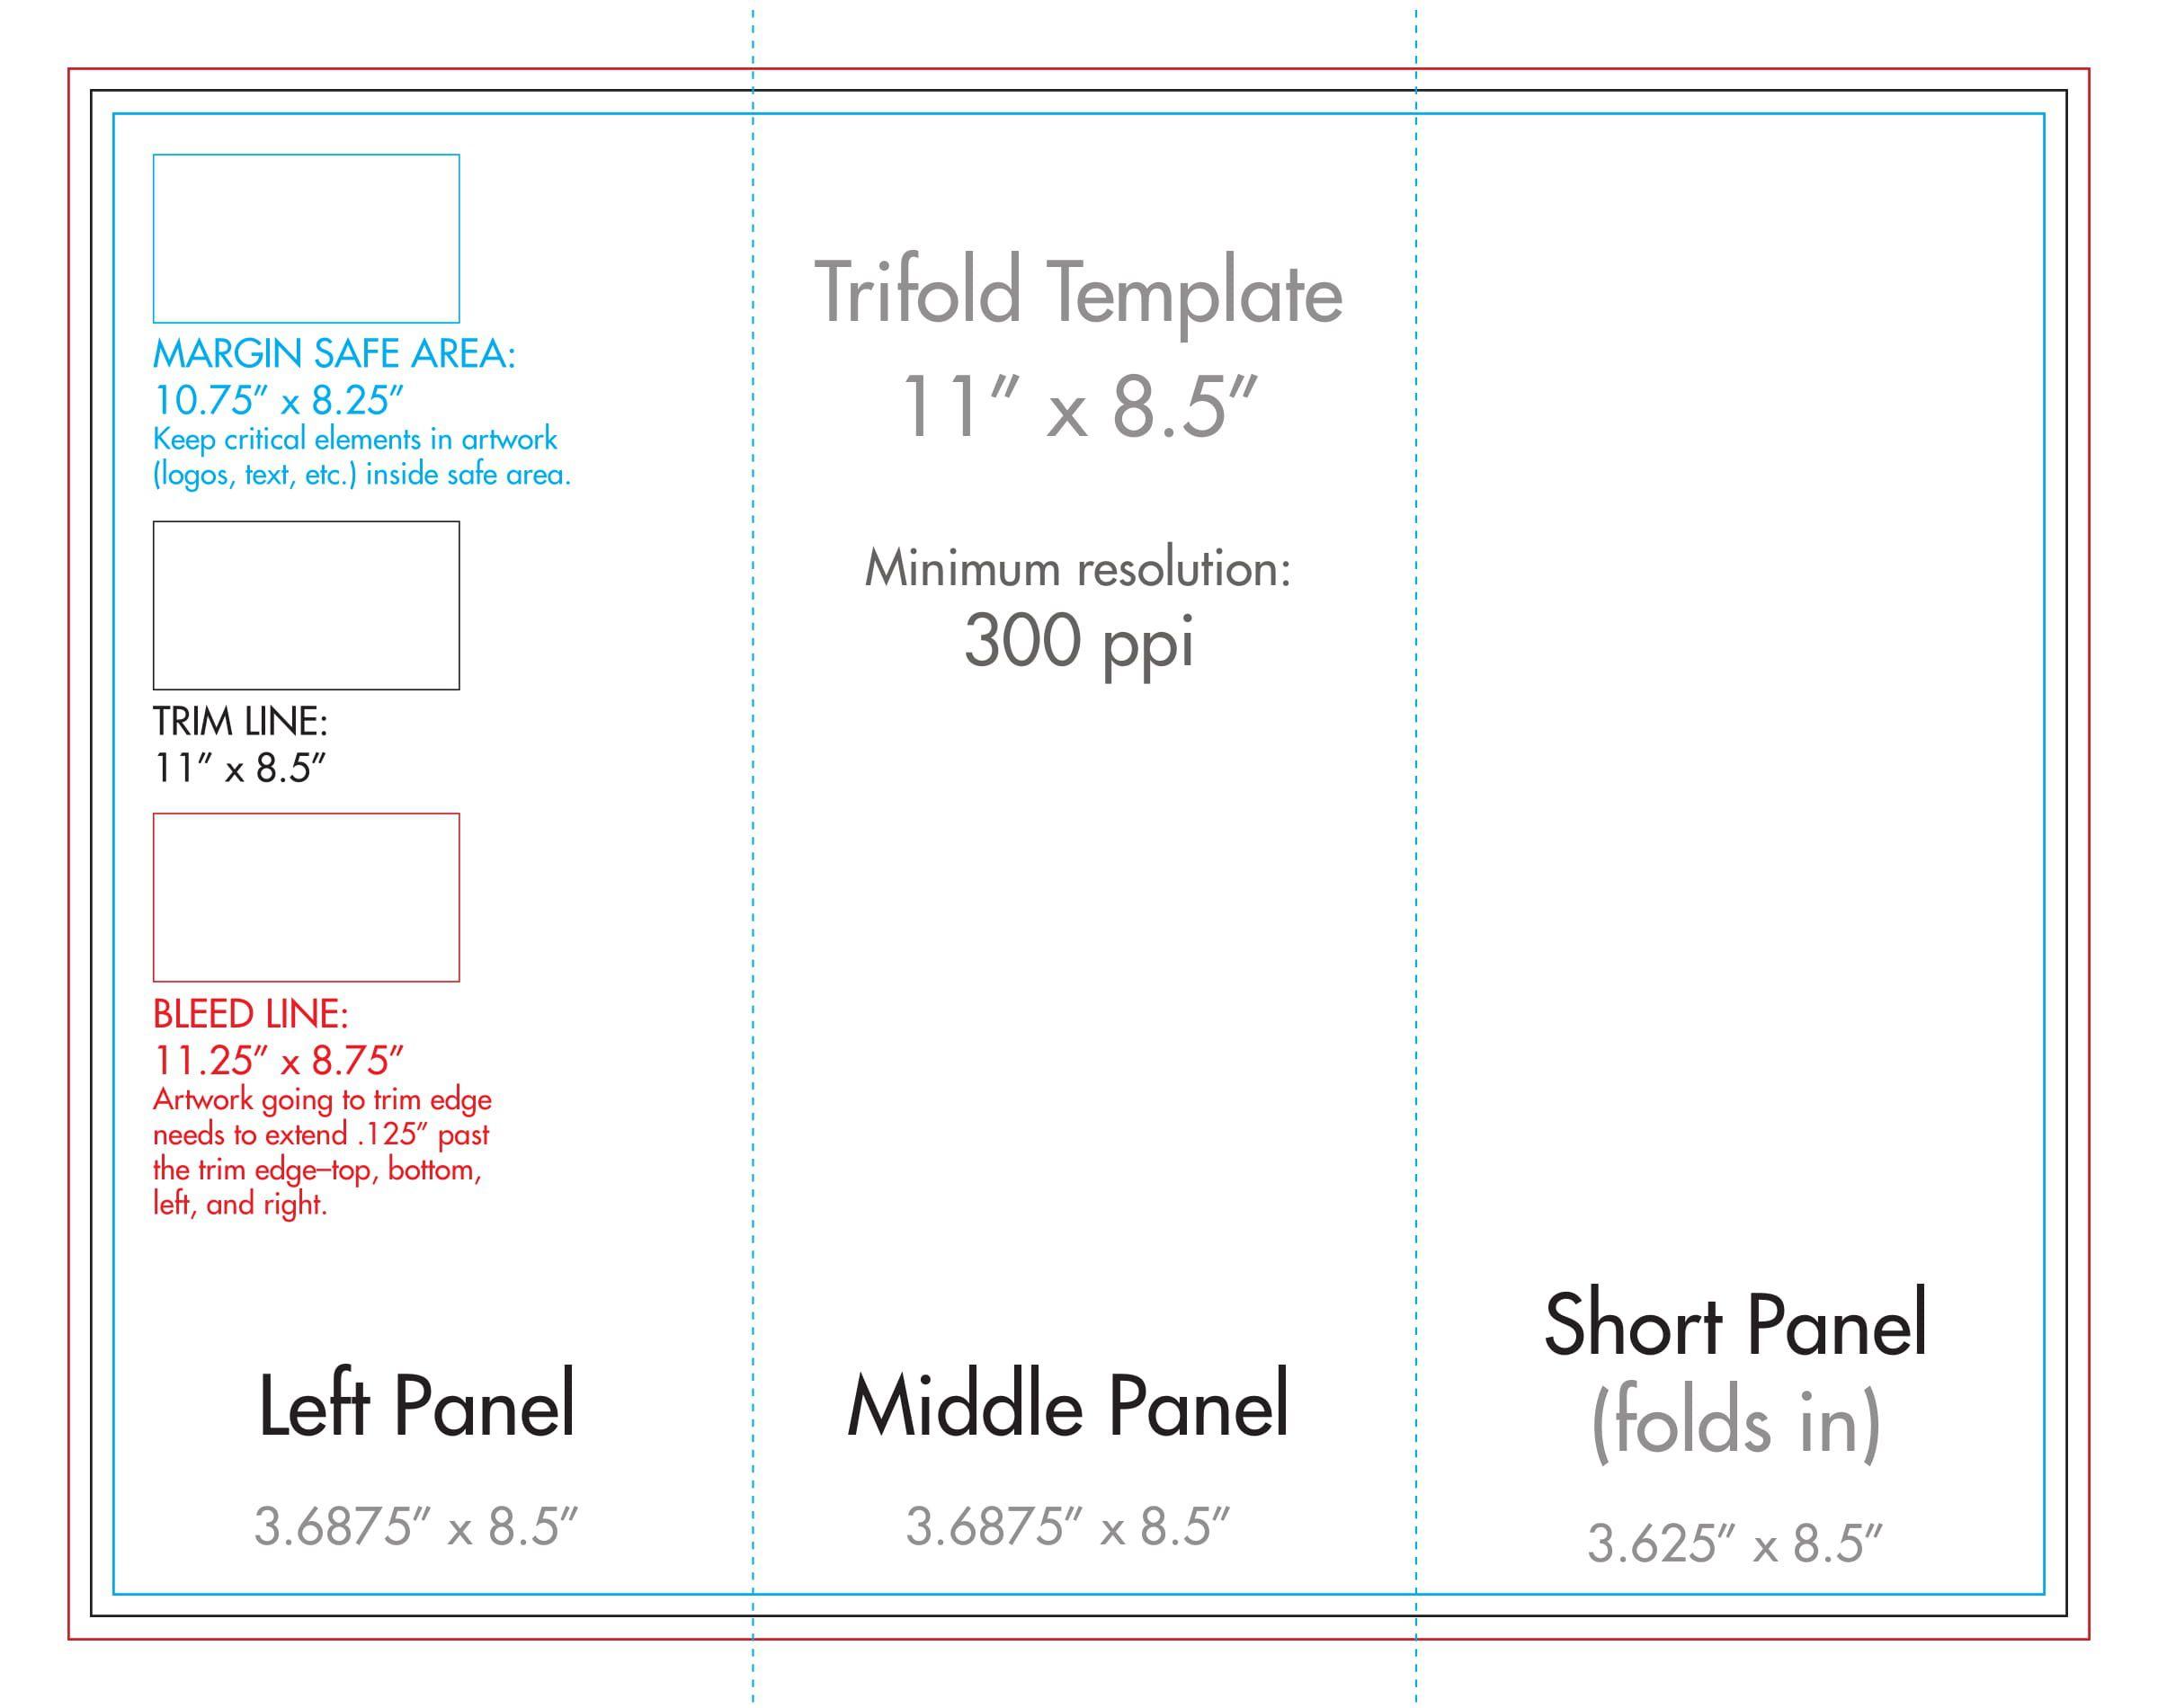 007 Wondrou 3 Fold Brochure Template Concept  Templates For FreeFull